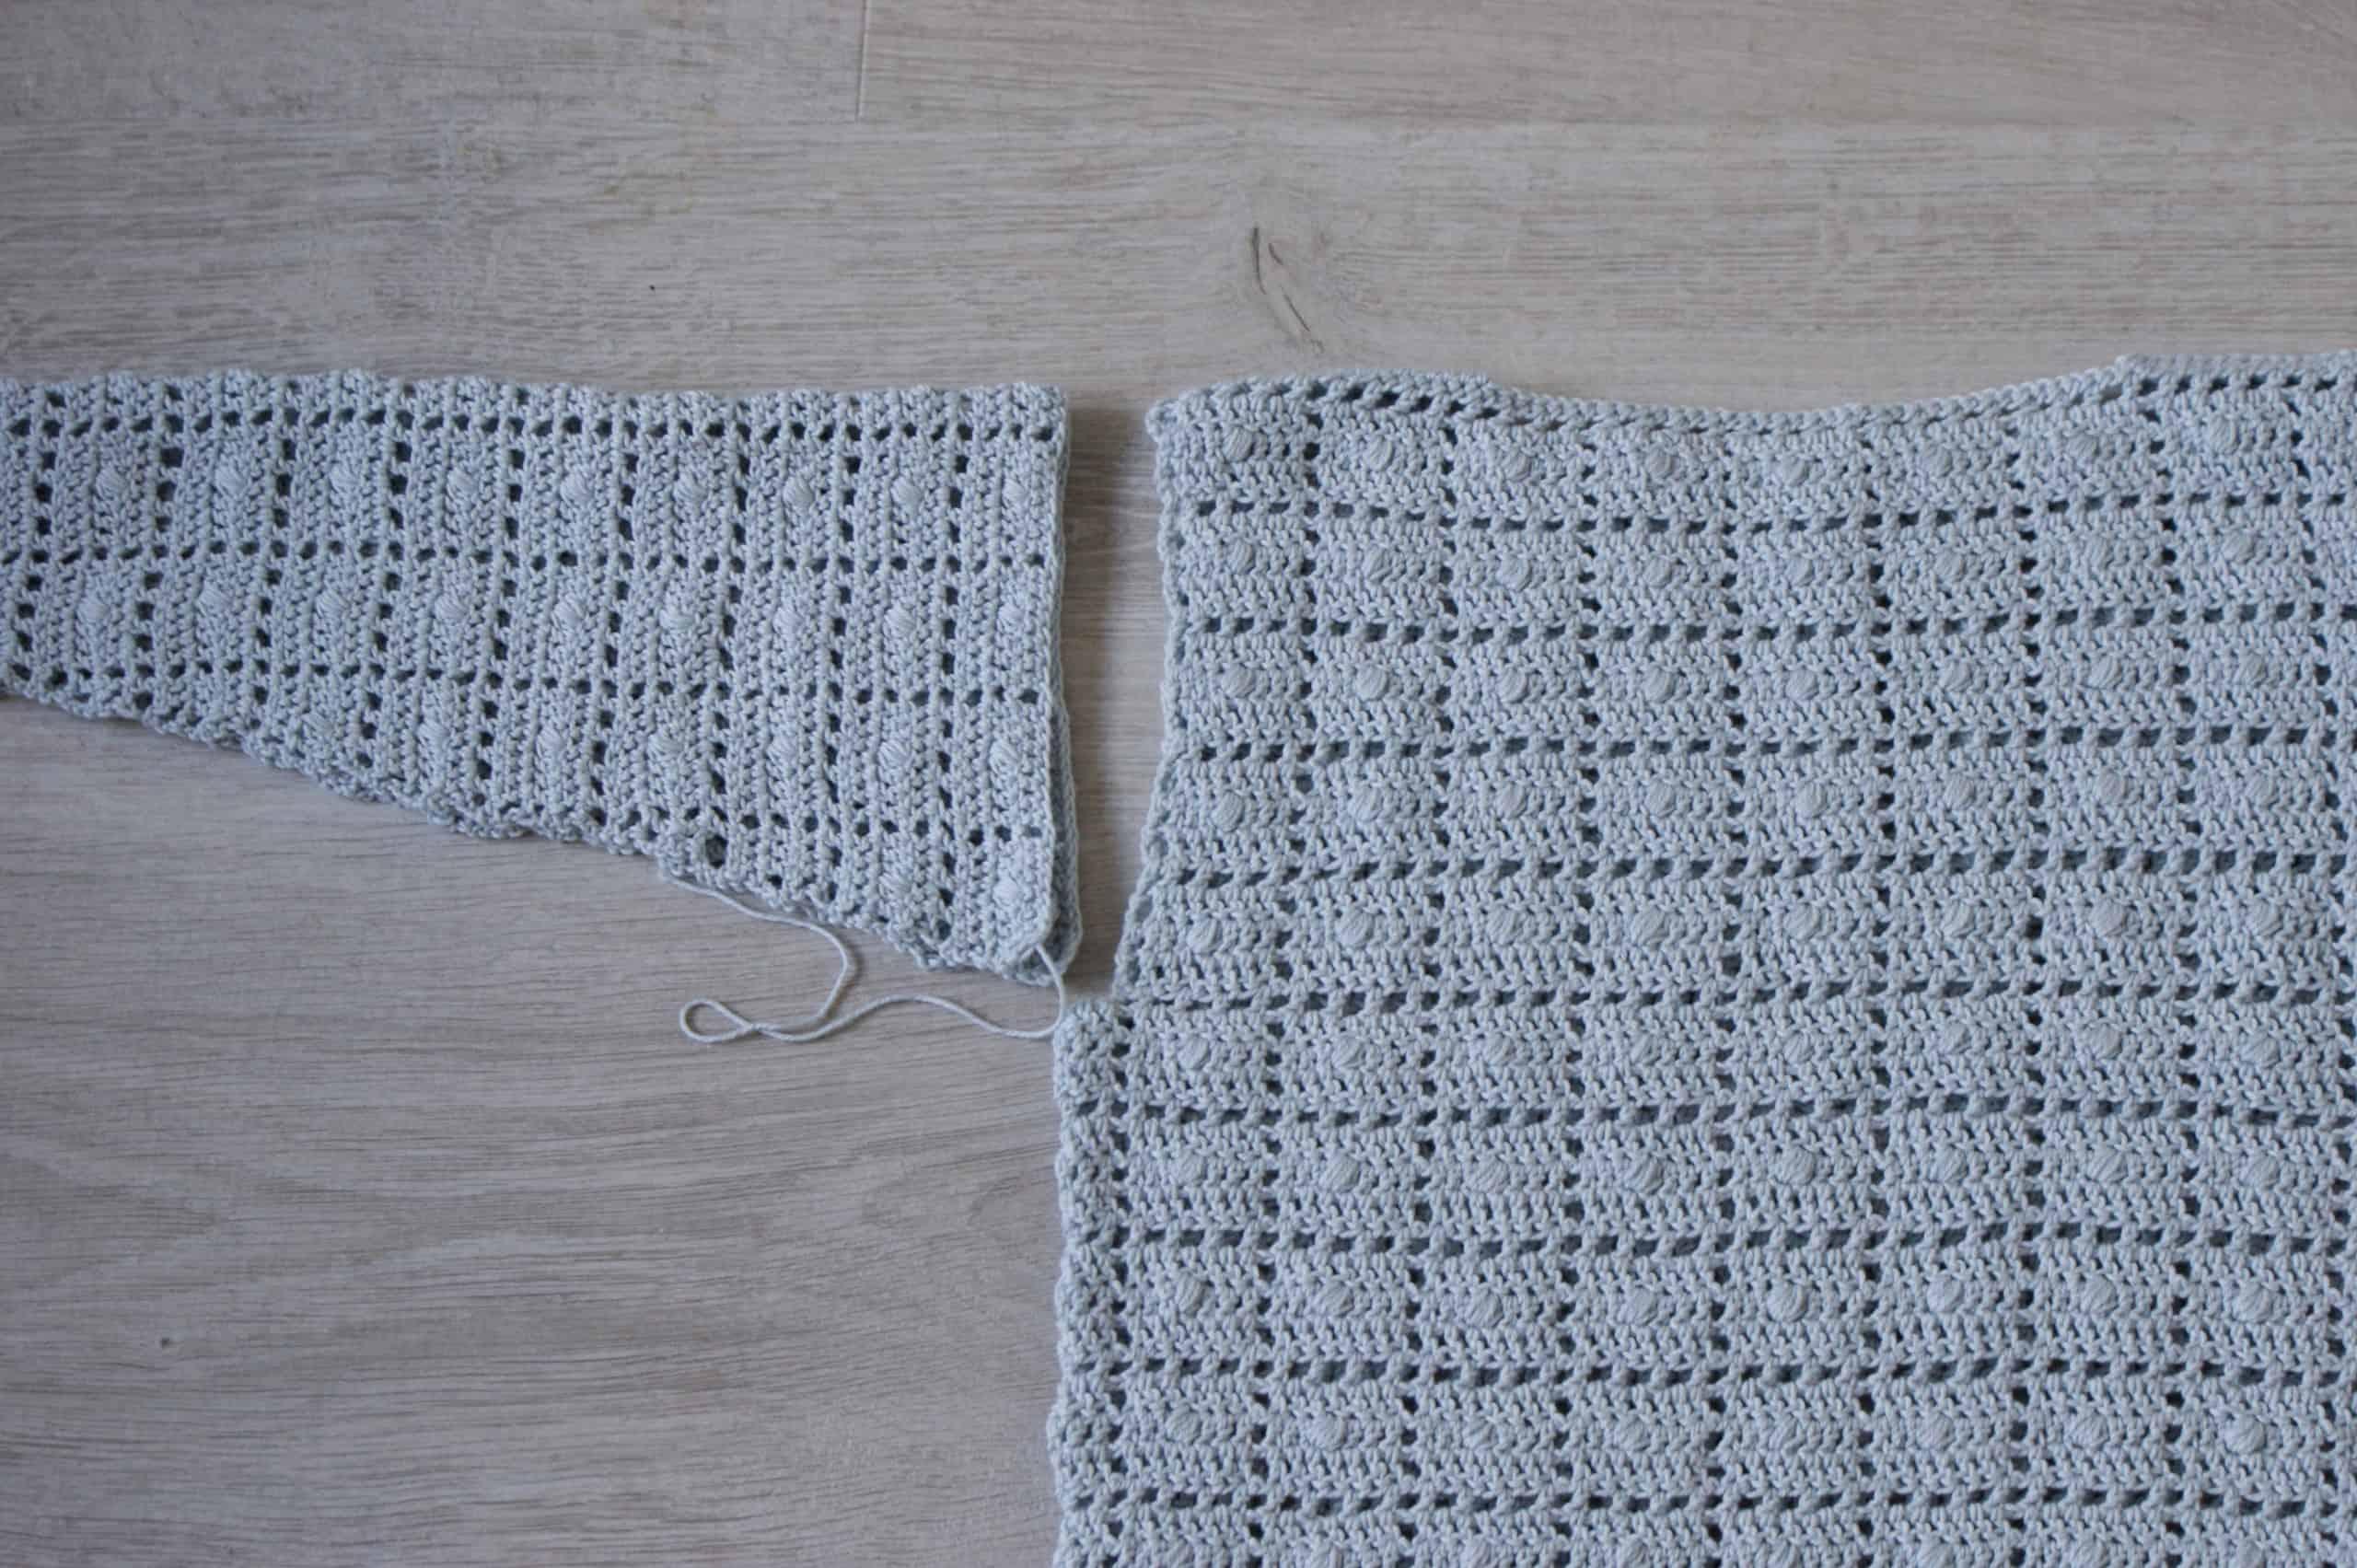 Crochet Modified drop sleeve construction